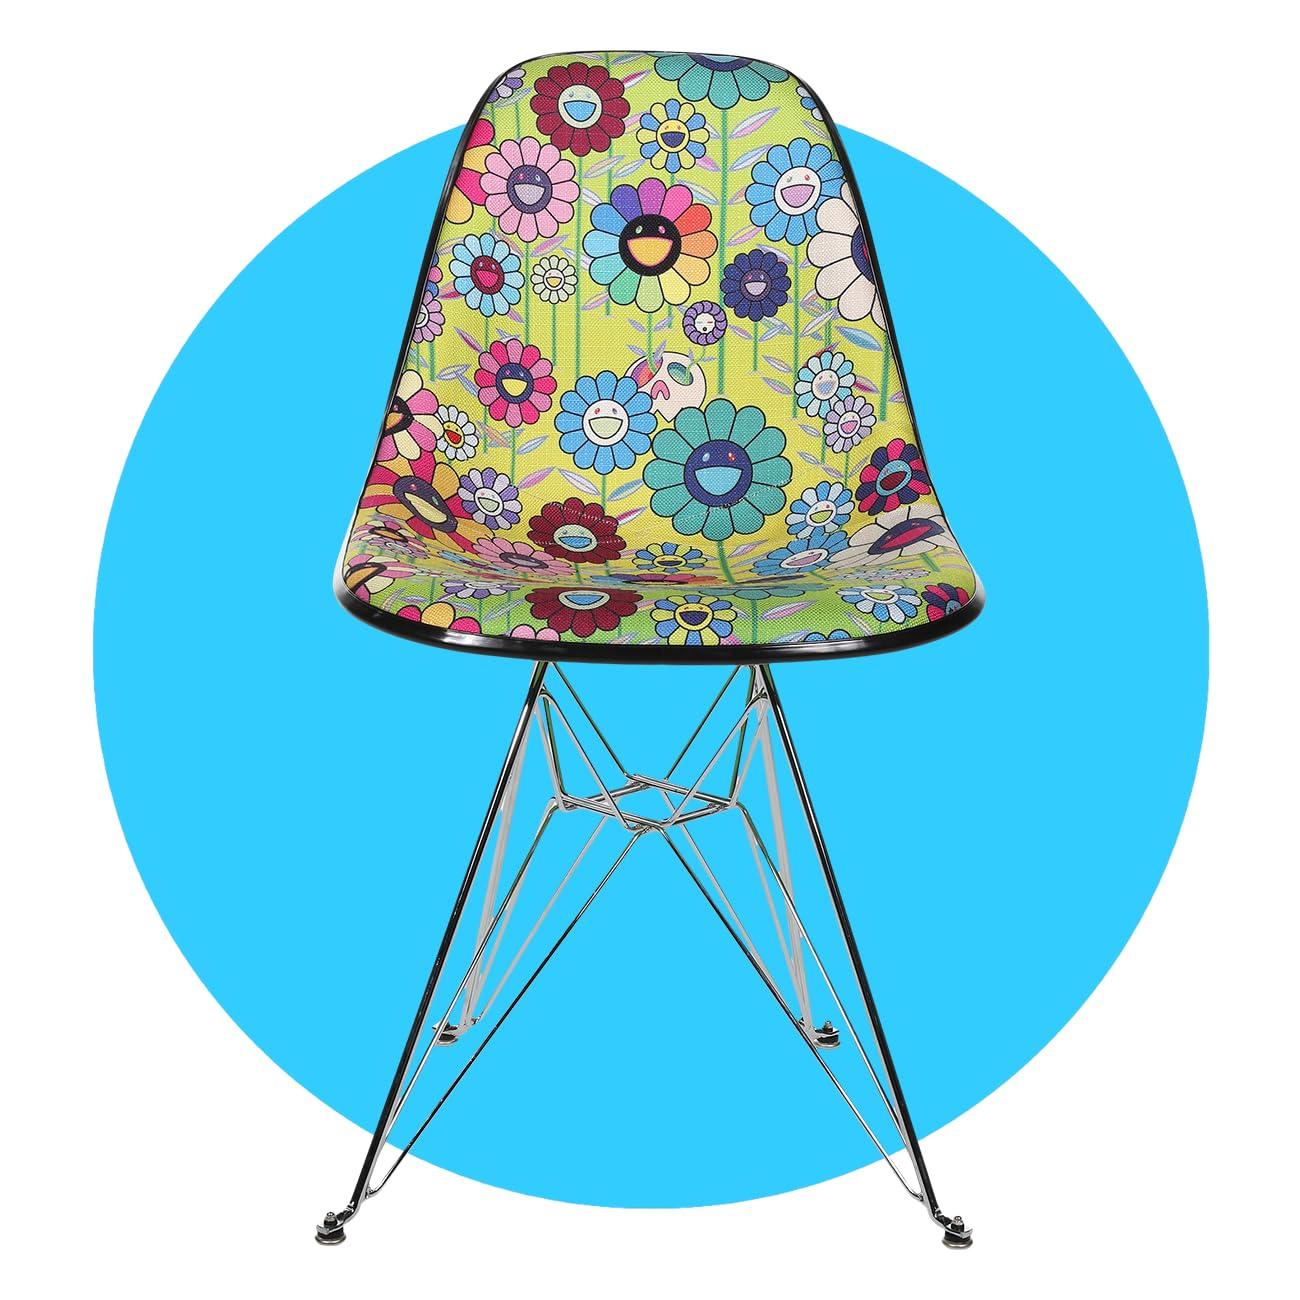 ComplexCon Takashi Murakami x Modernica TMKK Chair